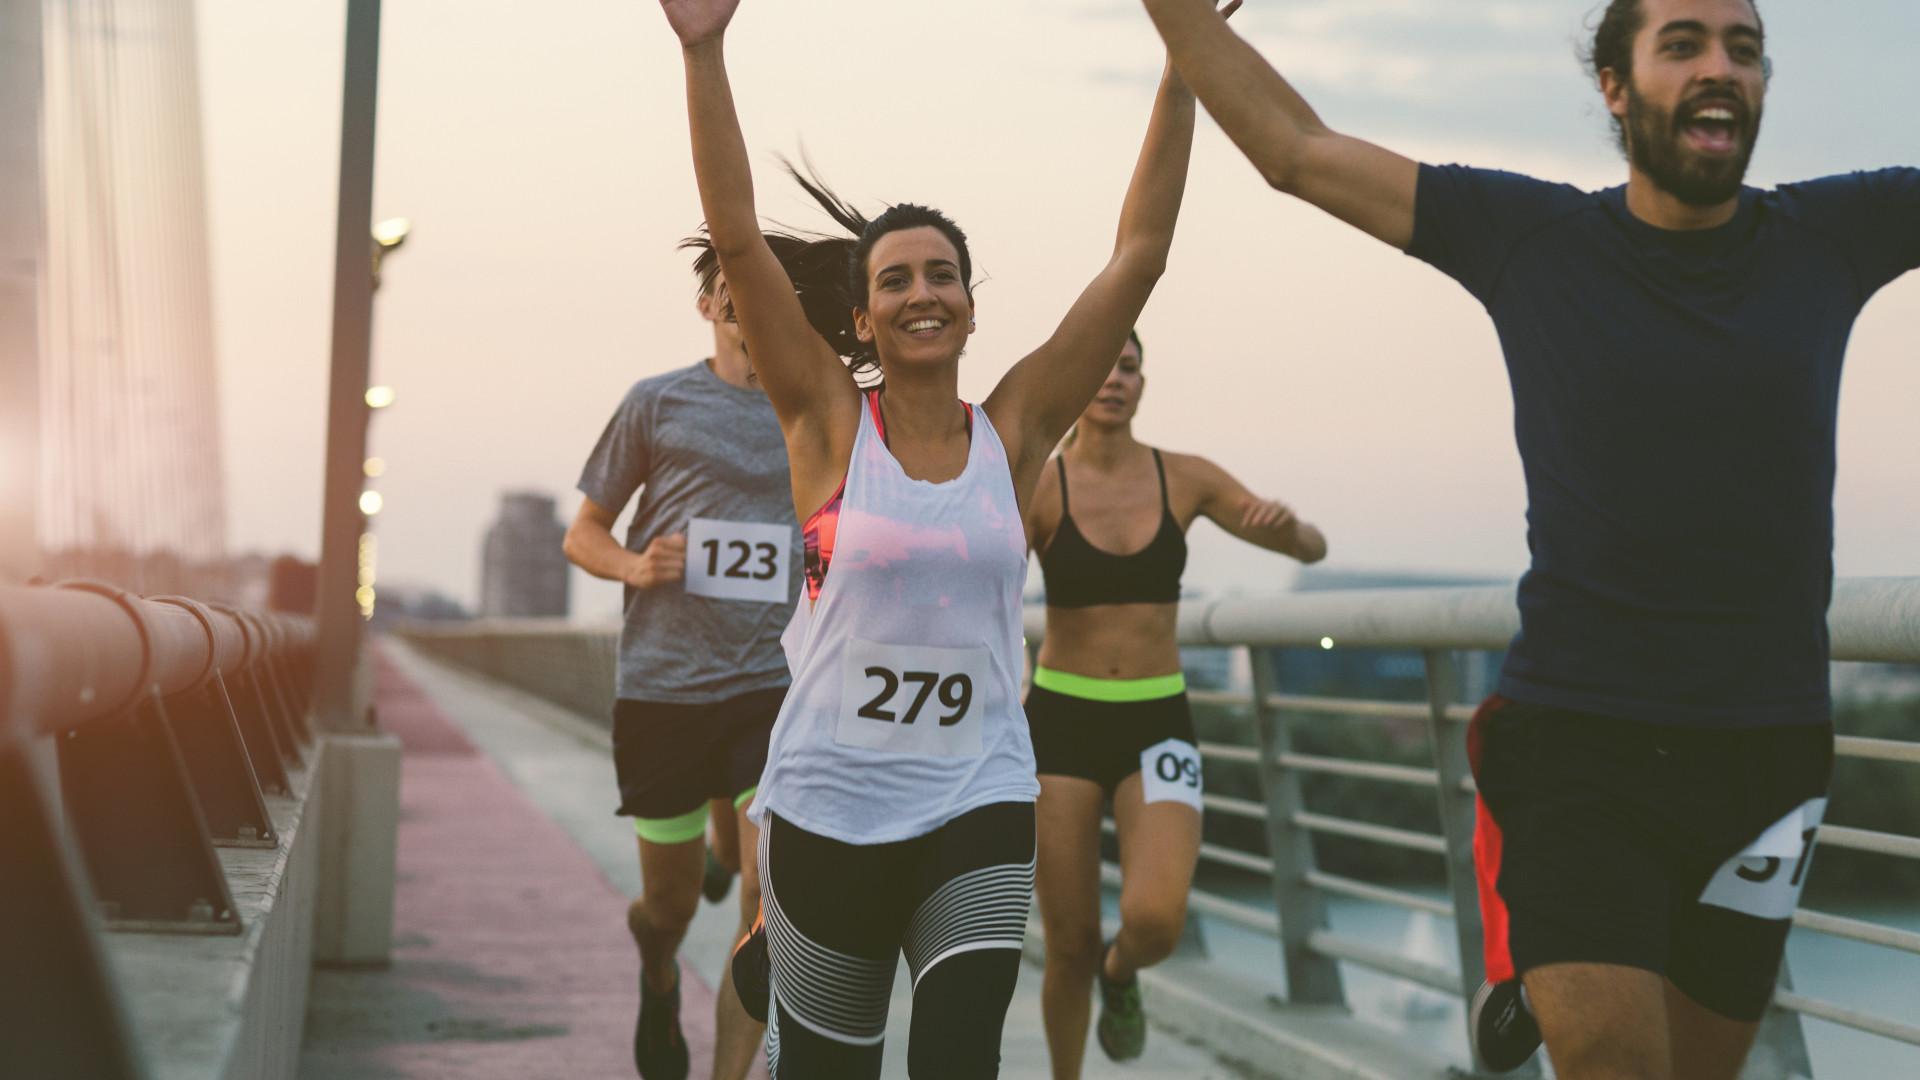 EDP Meia Maratona de Lisboa: Será que o seu corpo está preparado?